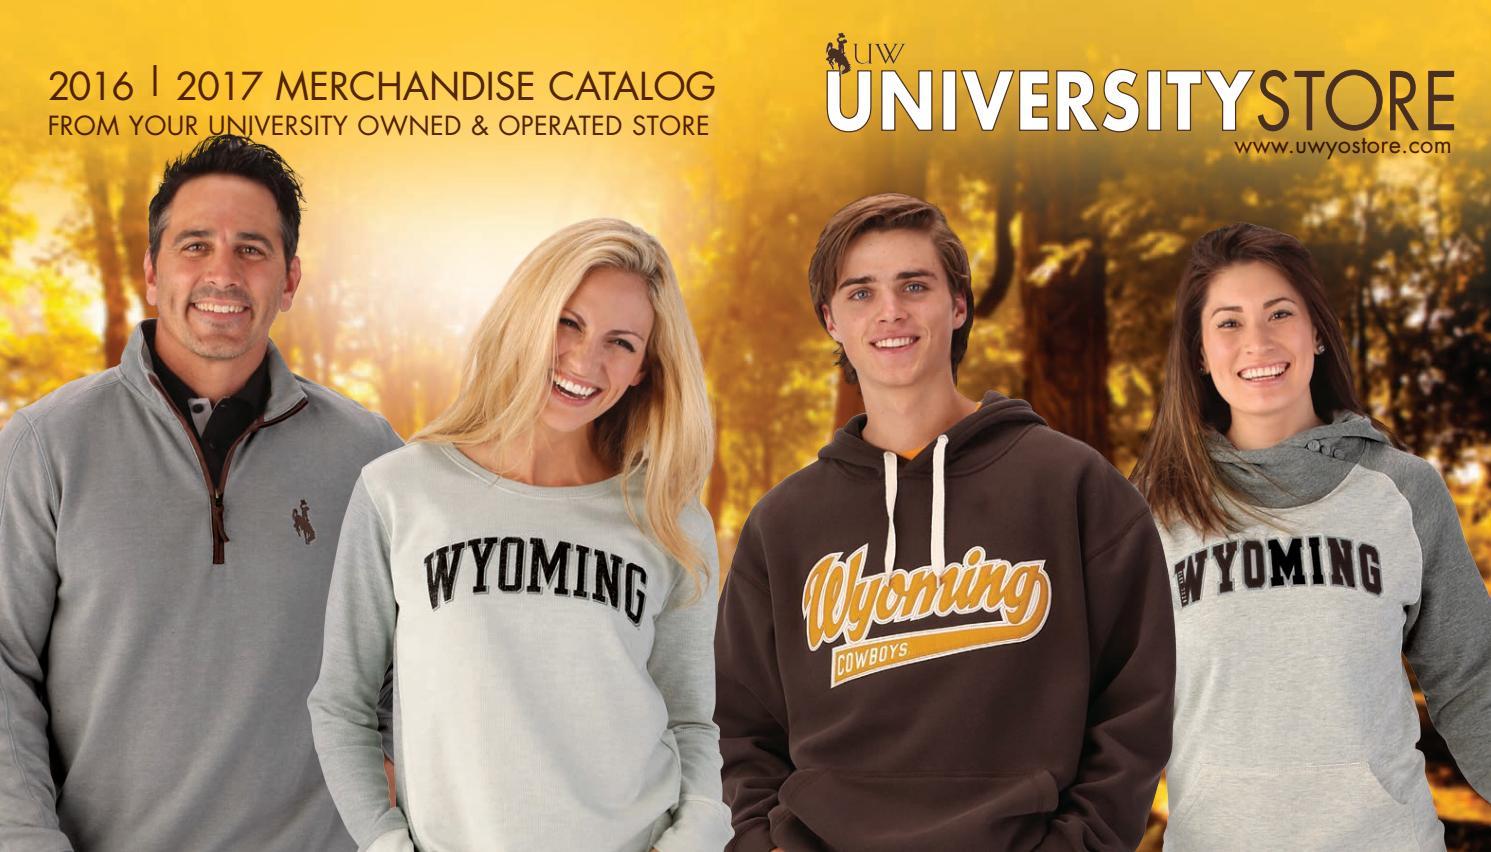 University Store 2016 | 2017 Merchandise Catalog by University Store